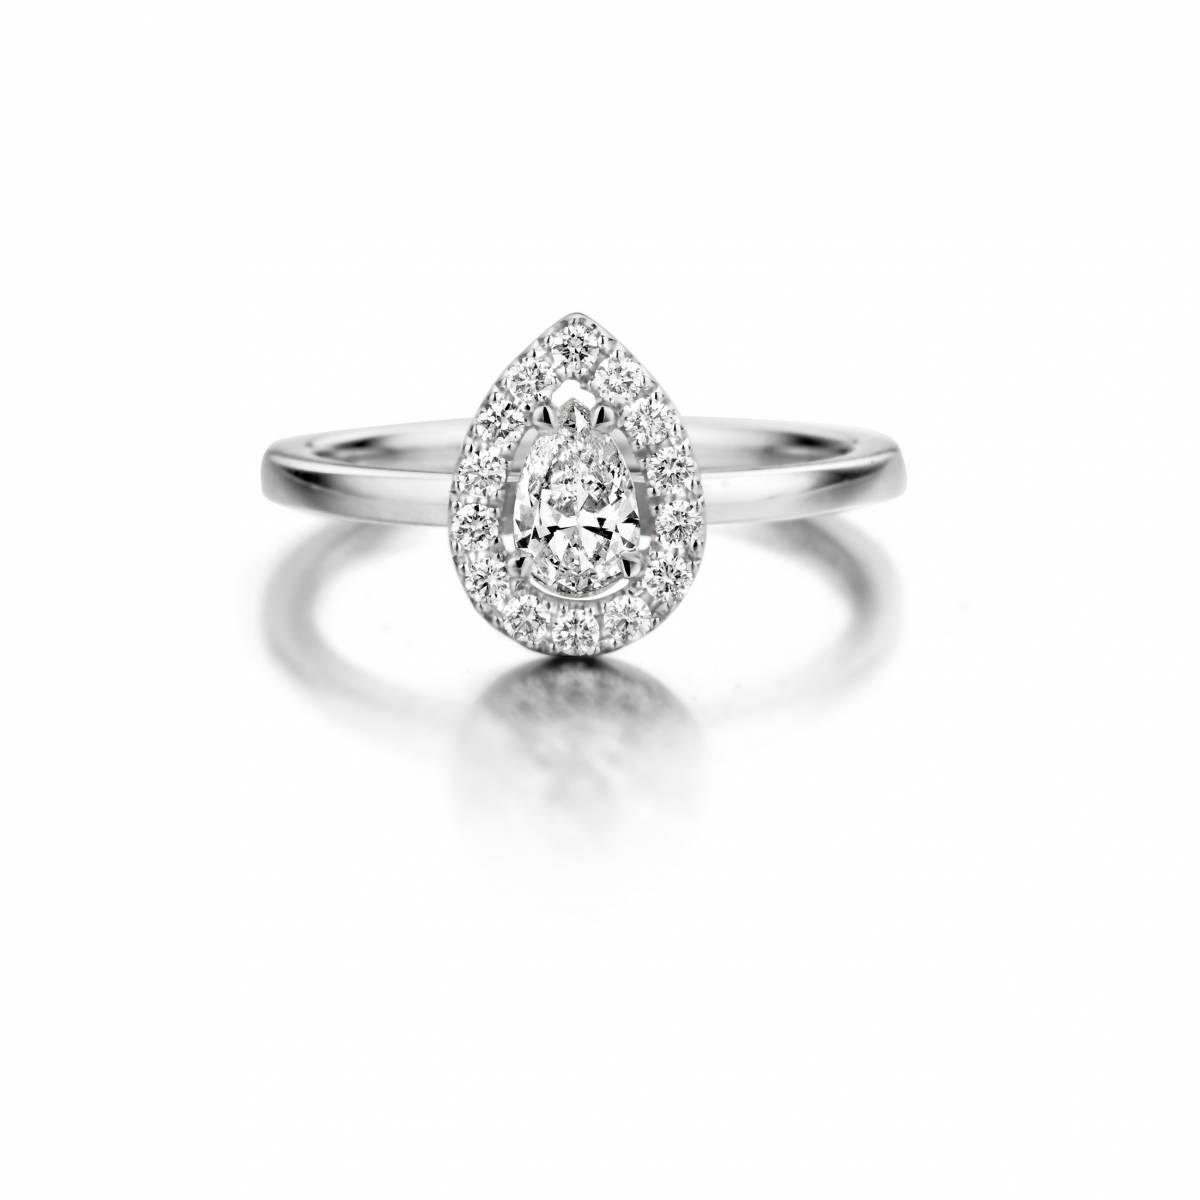 Juwelier Martens - Verlovingsringen - Trouwringen - Juwelen huwelijk - House of Weddings - 1